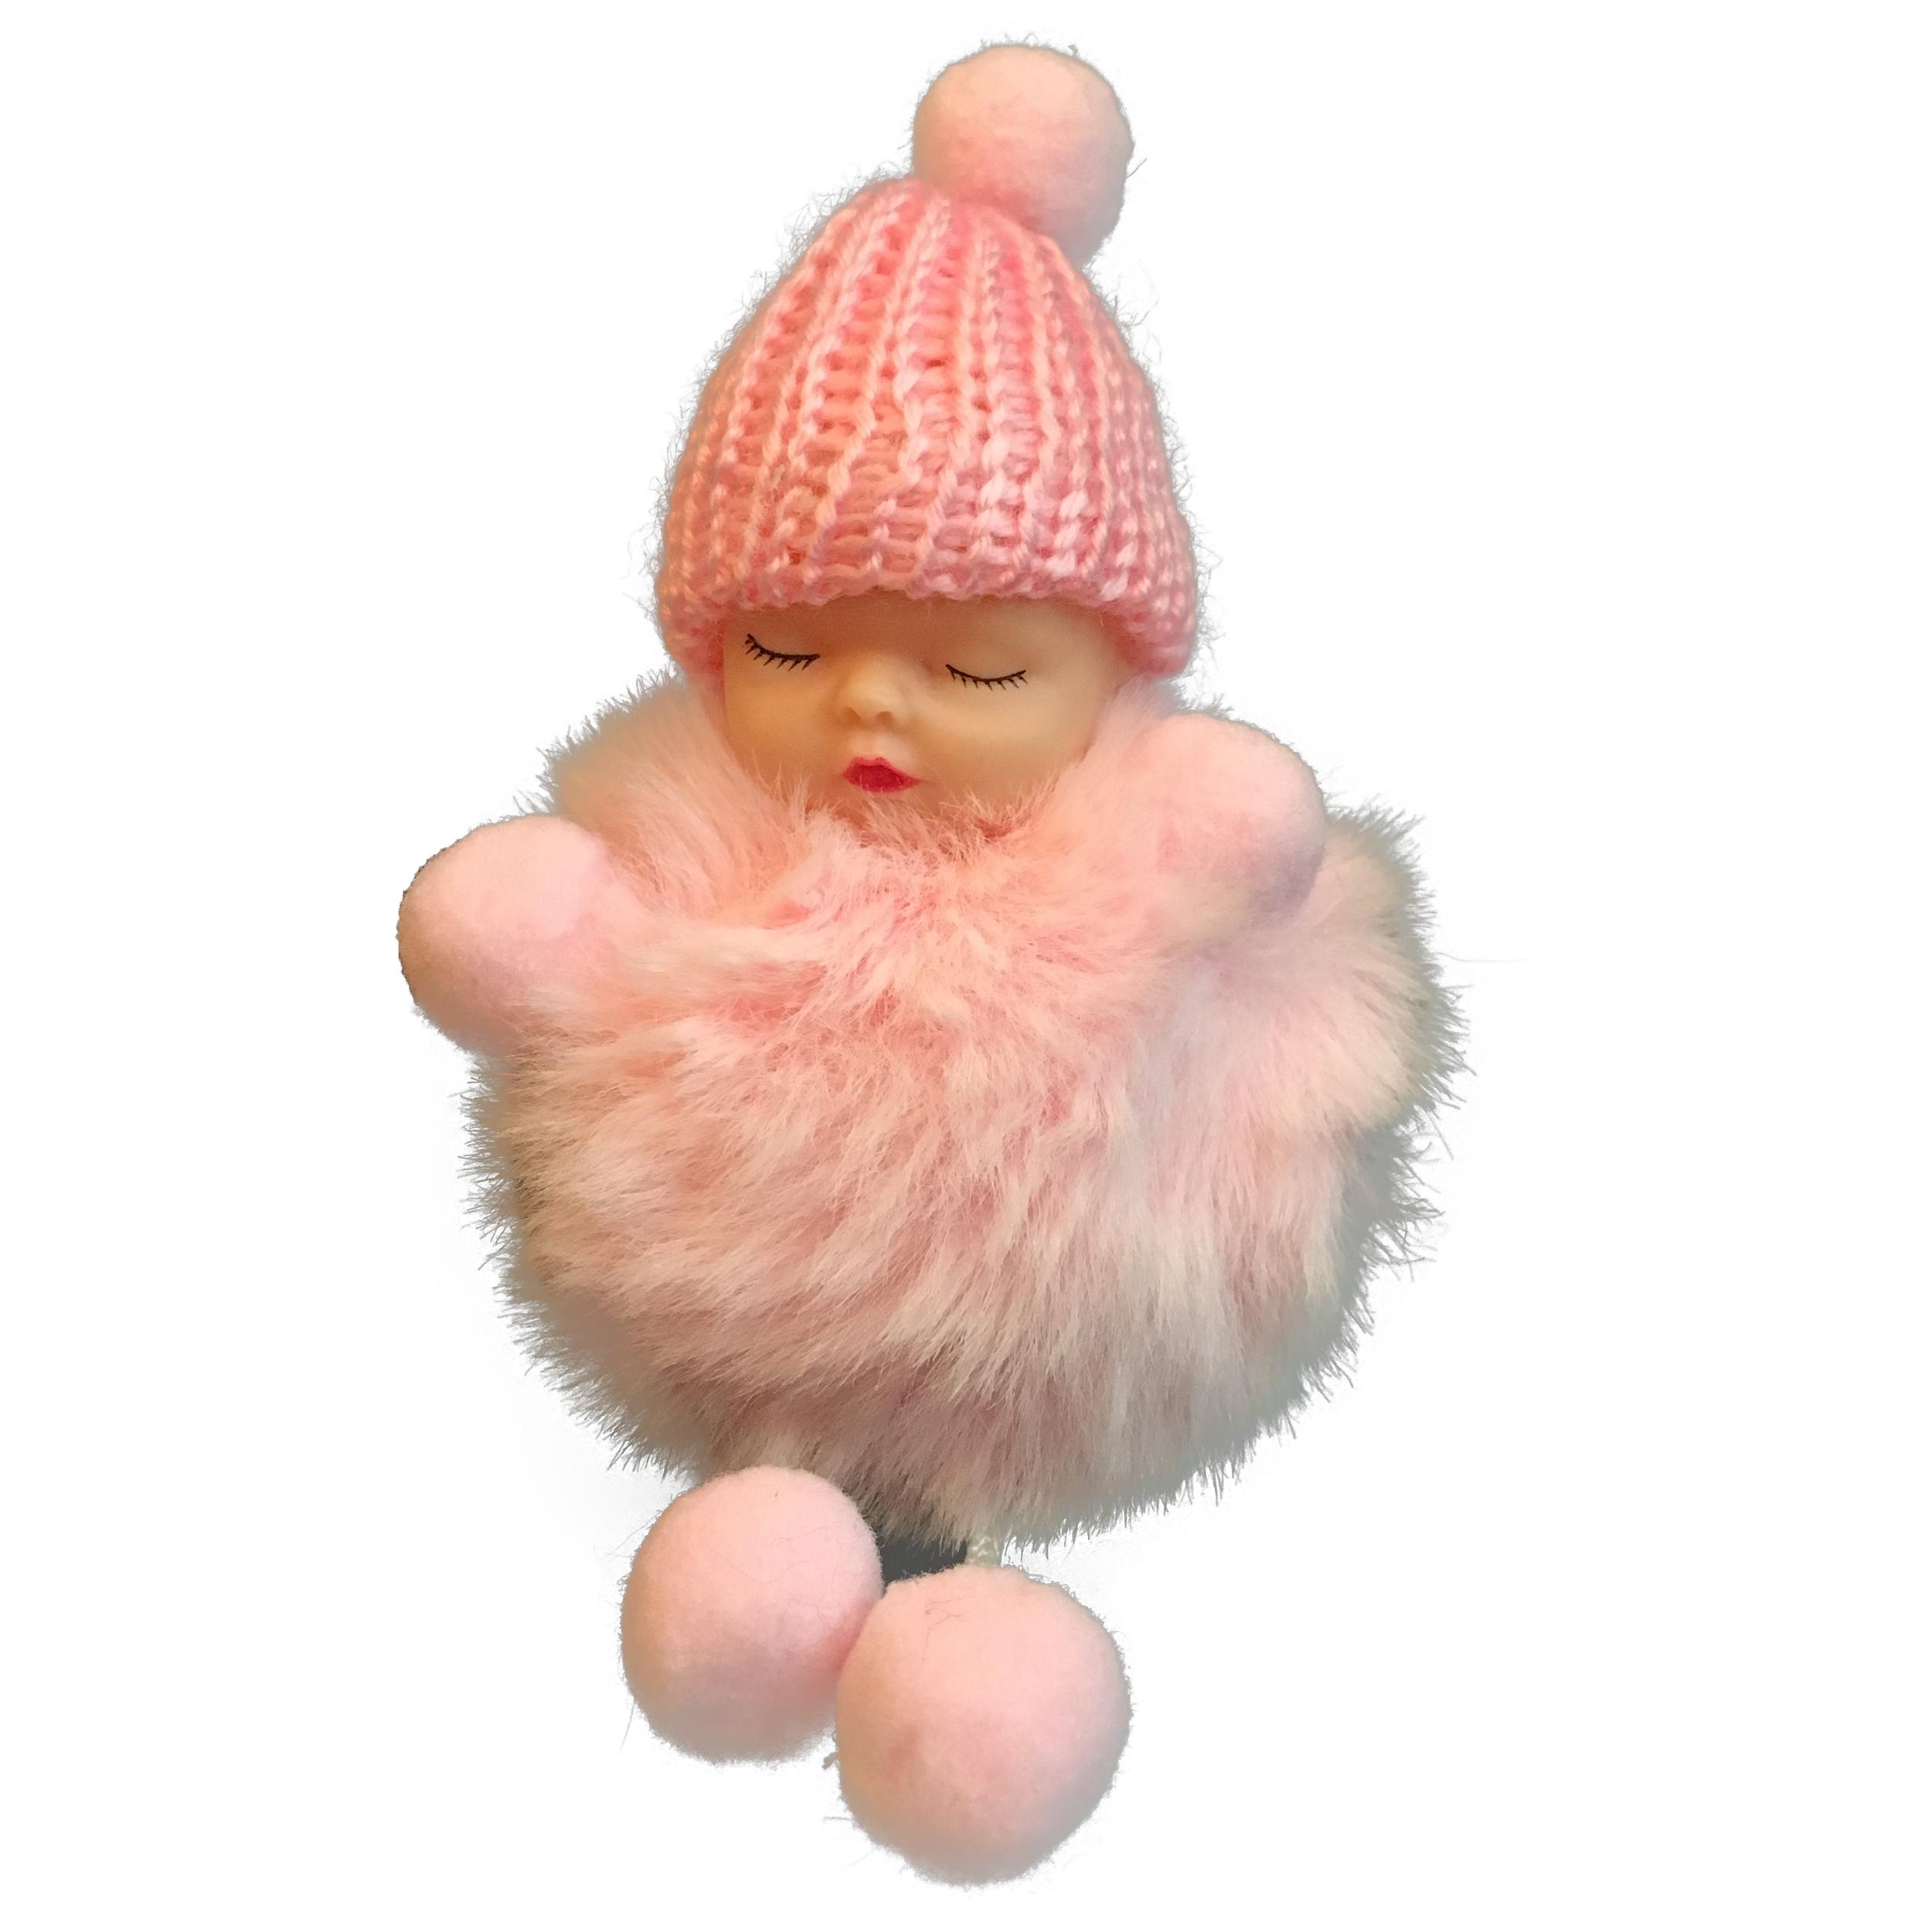 جاسوئیچی عروسکی مدل نوزاد لباس پشمالو